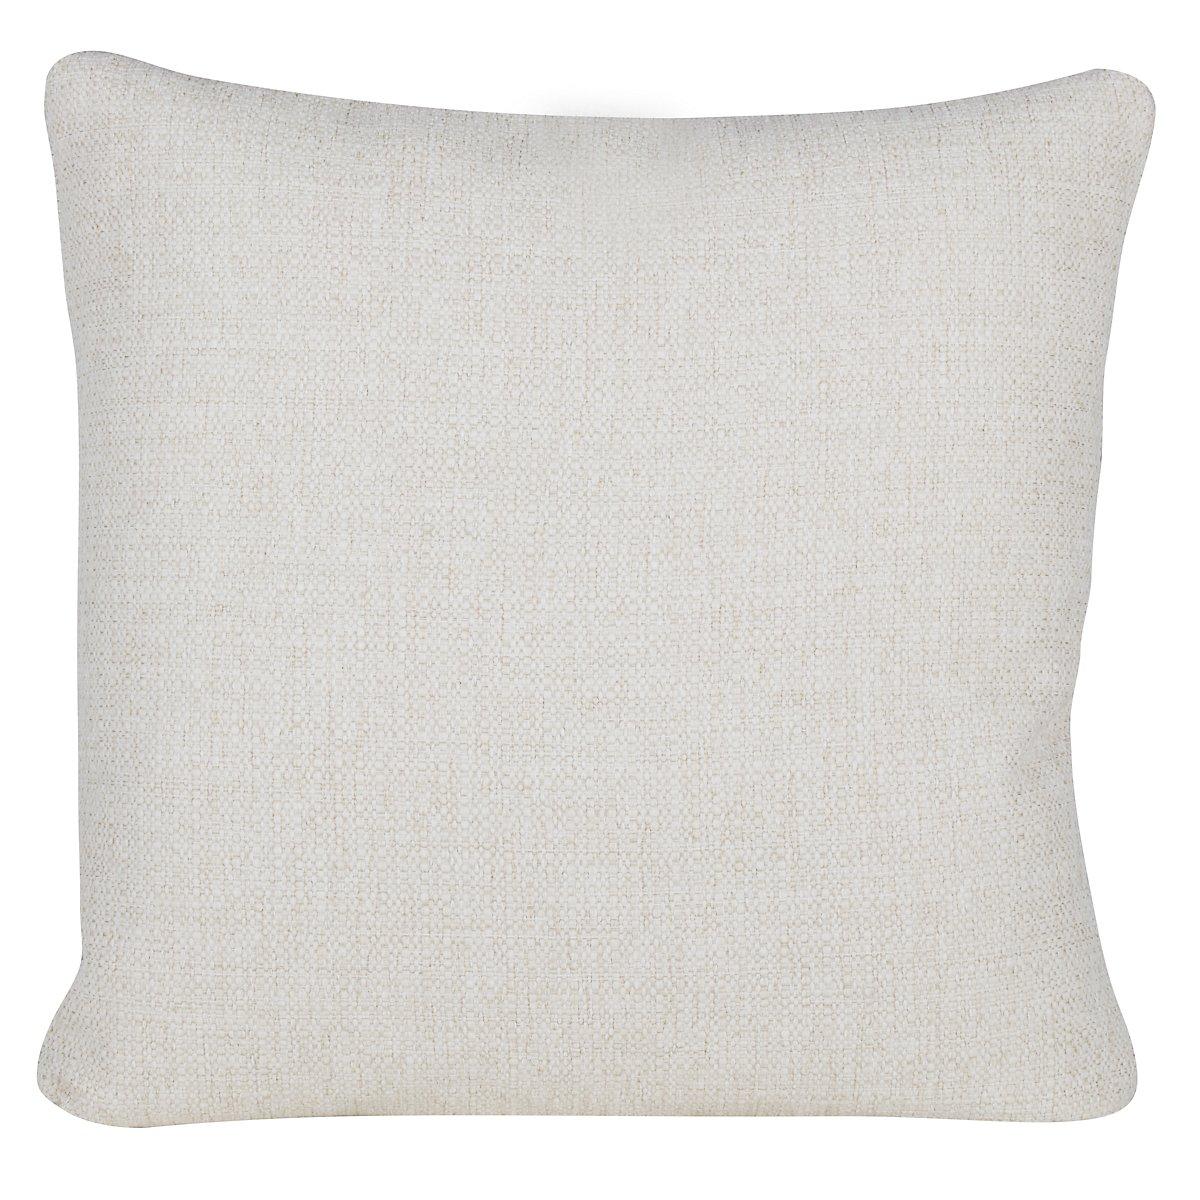 City Furniture: Austin White Fabric Square Accent Pillow